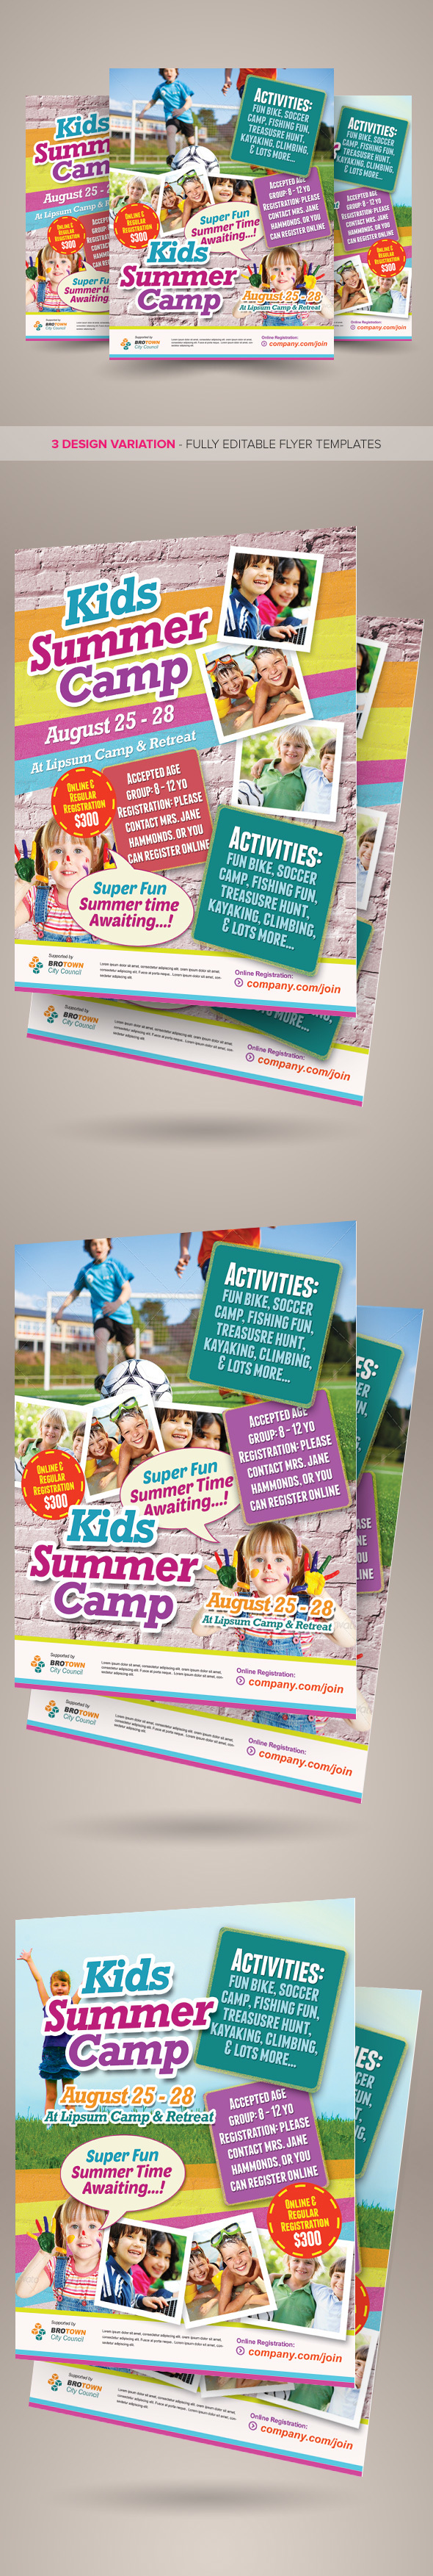 Kids Summer Camp Flyers Vol.02 on Behance   MMO   Pinterest   Nidos ...